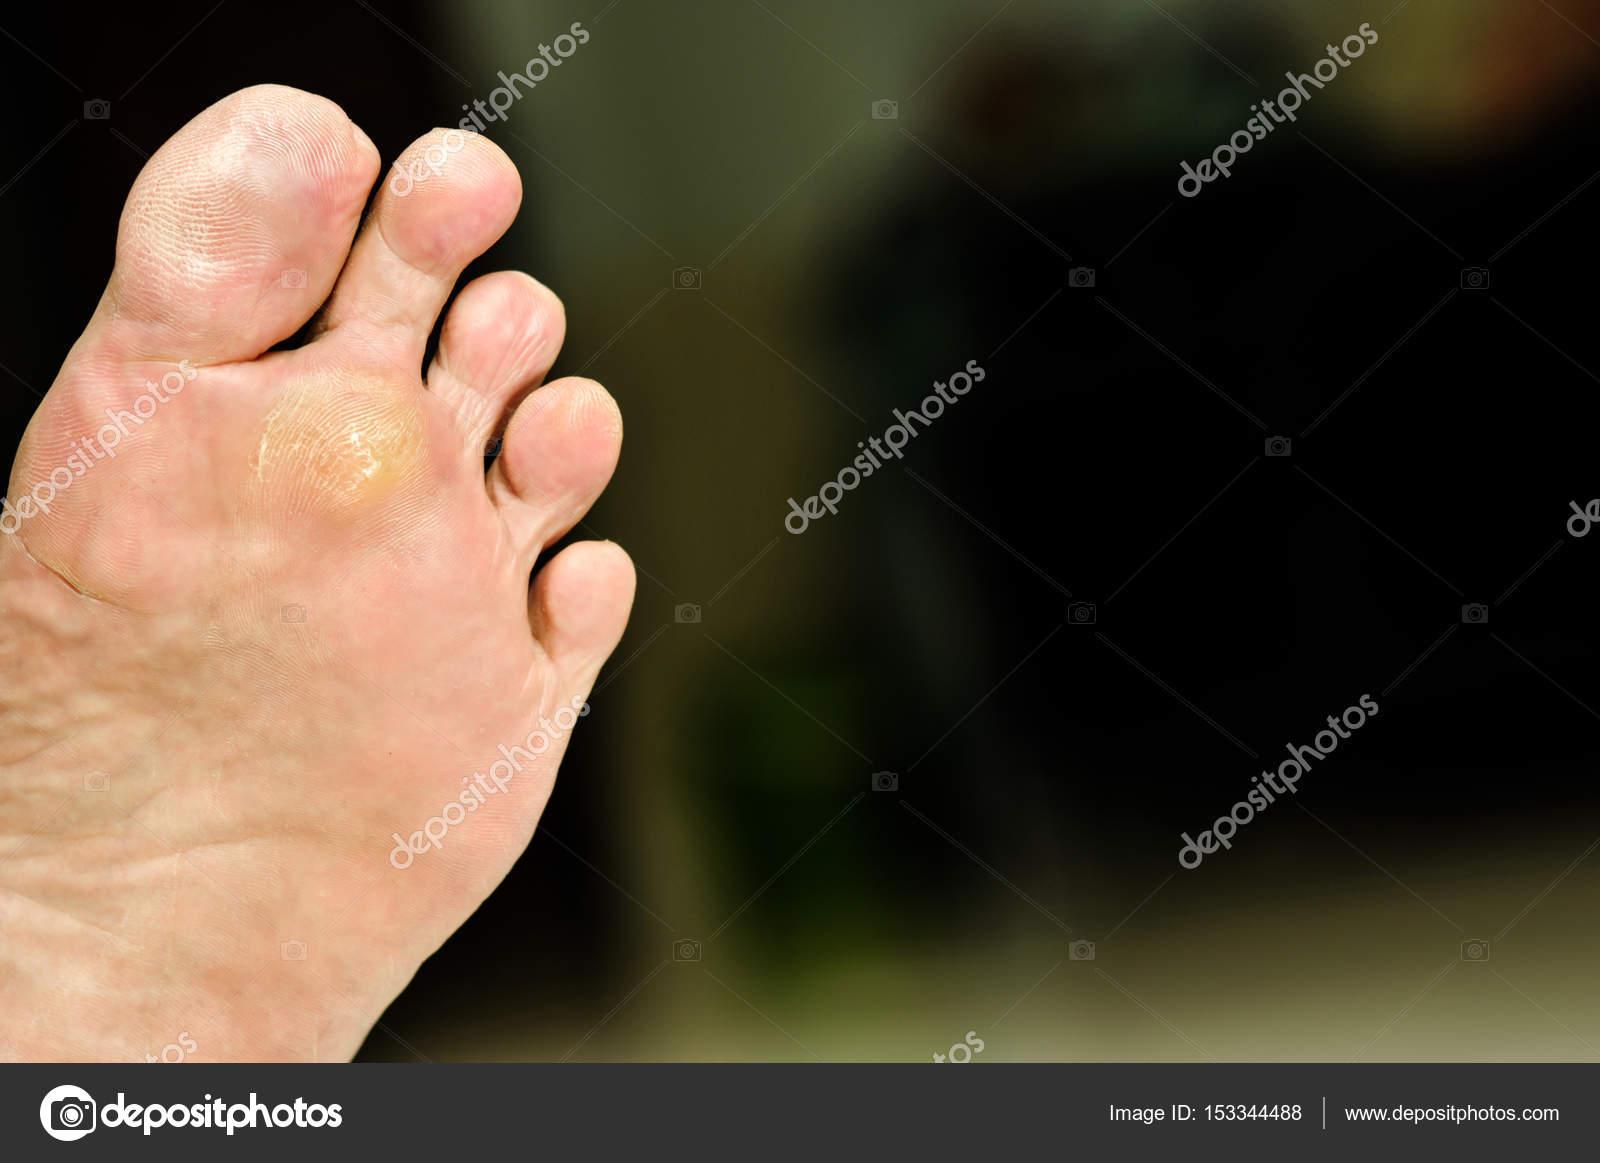 12 Best ciuperca piciorului images | Toenail fungus remedies, Toe fungus, Home remedies